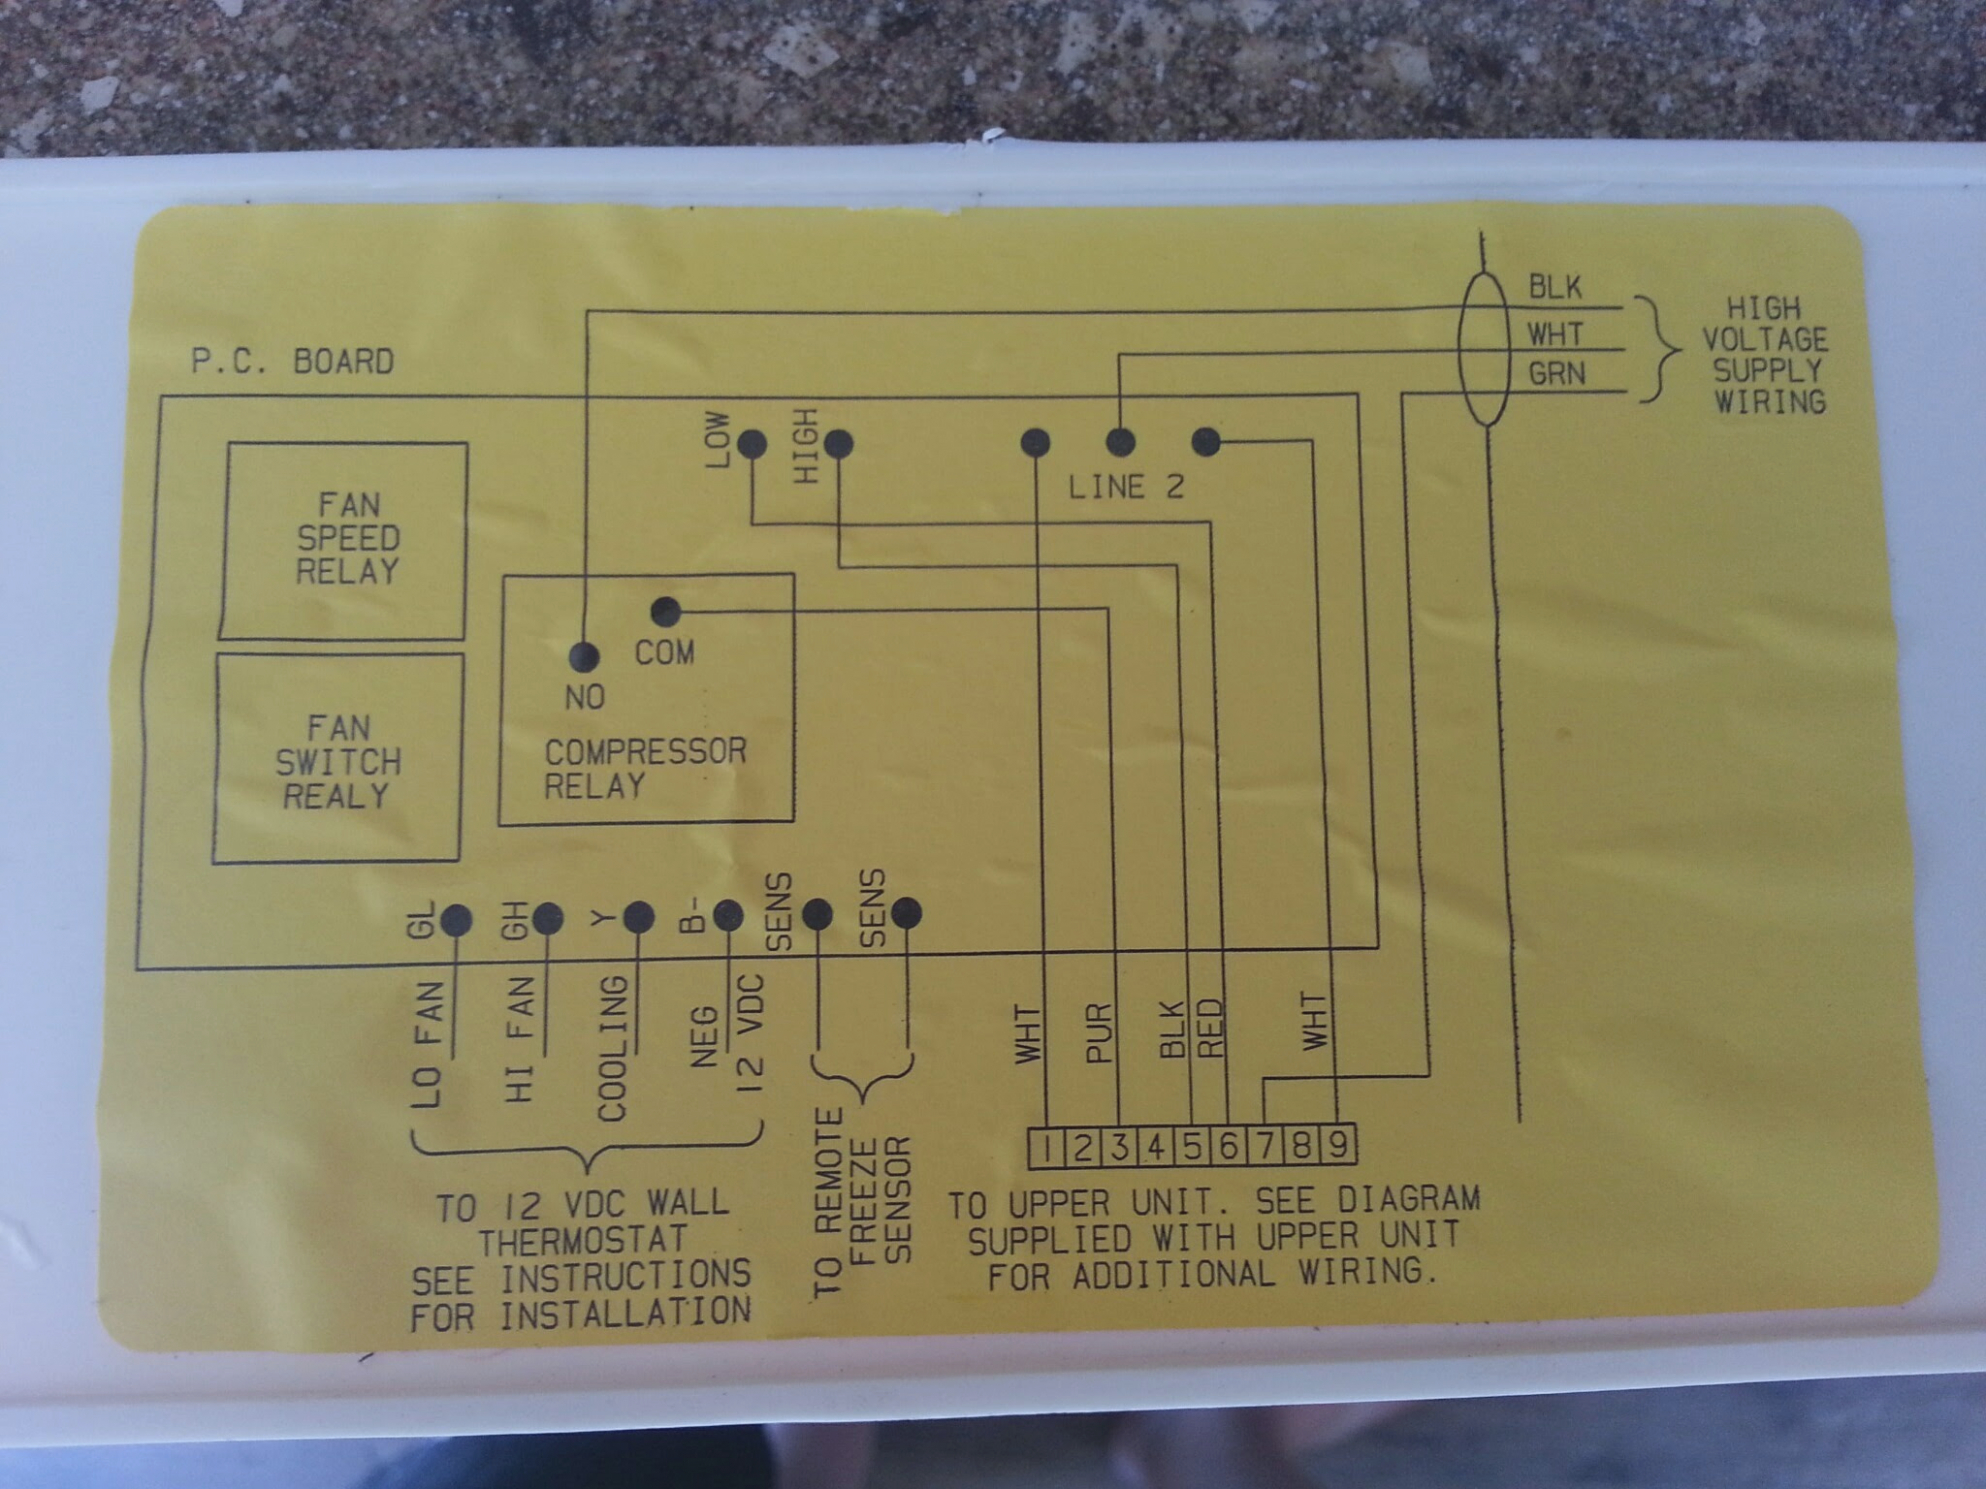 Rv Hvac Wiring | Wiring Diagram - Air Conditioner Thermostat Wiring Diagram